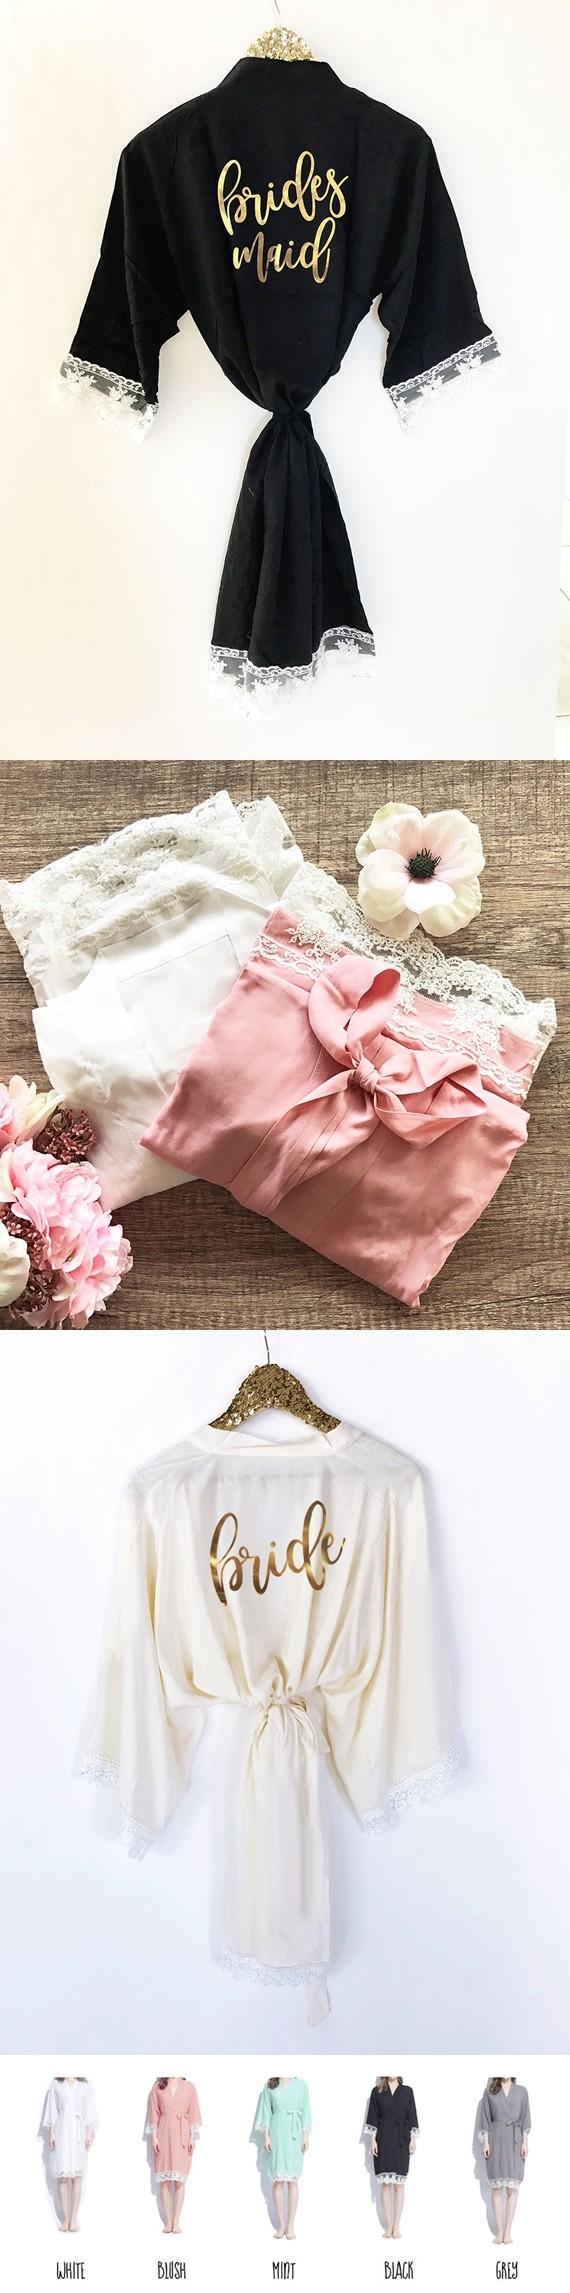 Event Blossom Bridal Party Cotton Lace Robes (5 Colors)